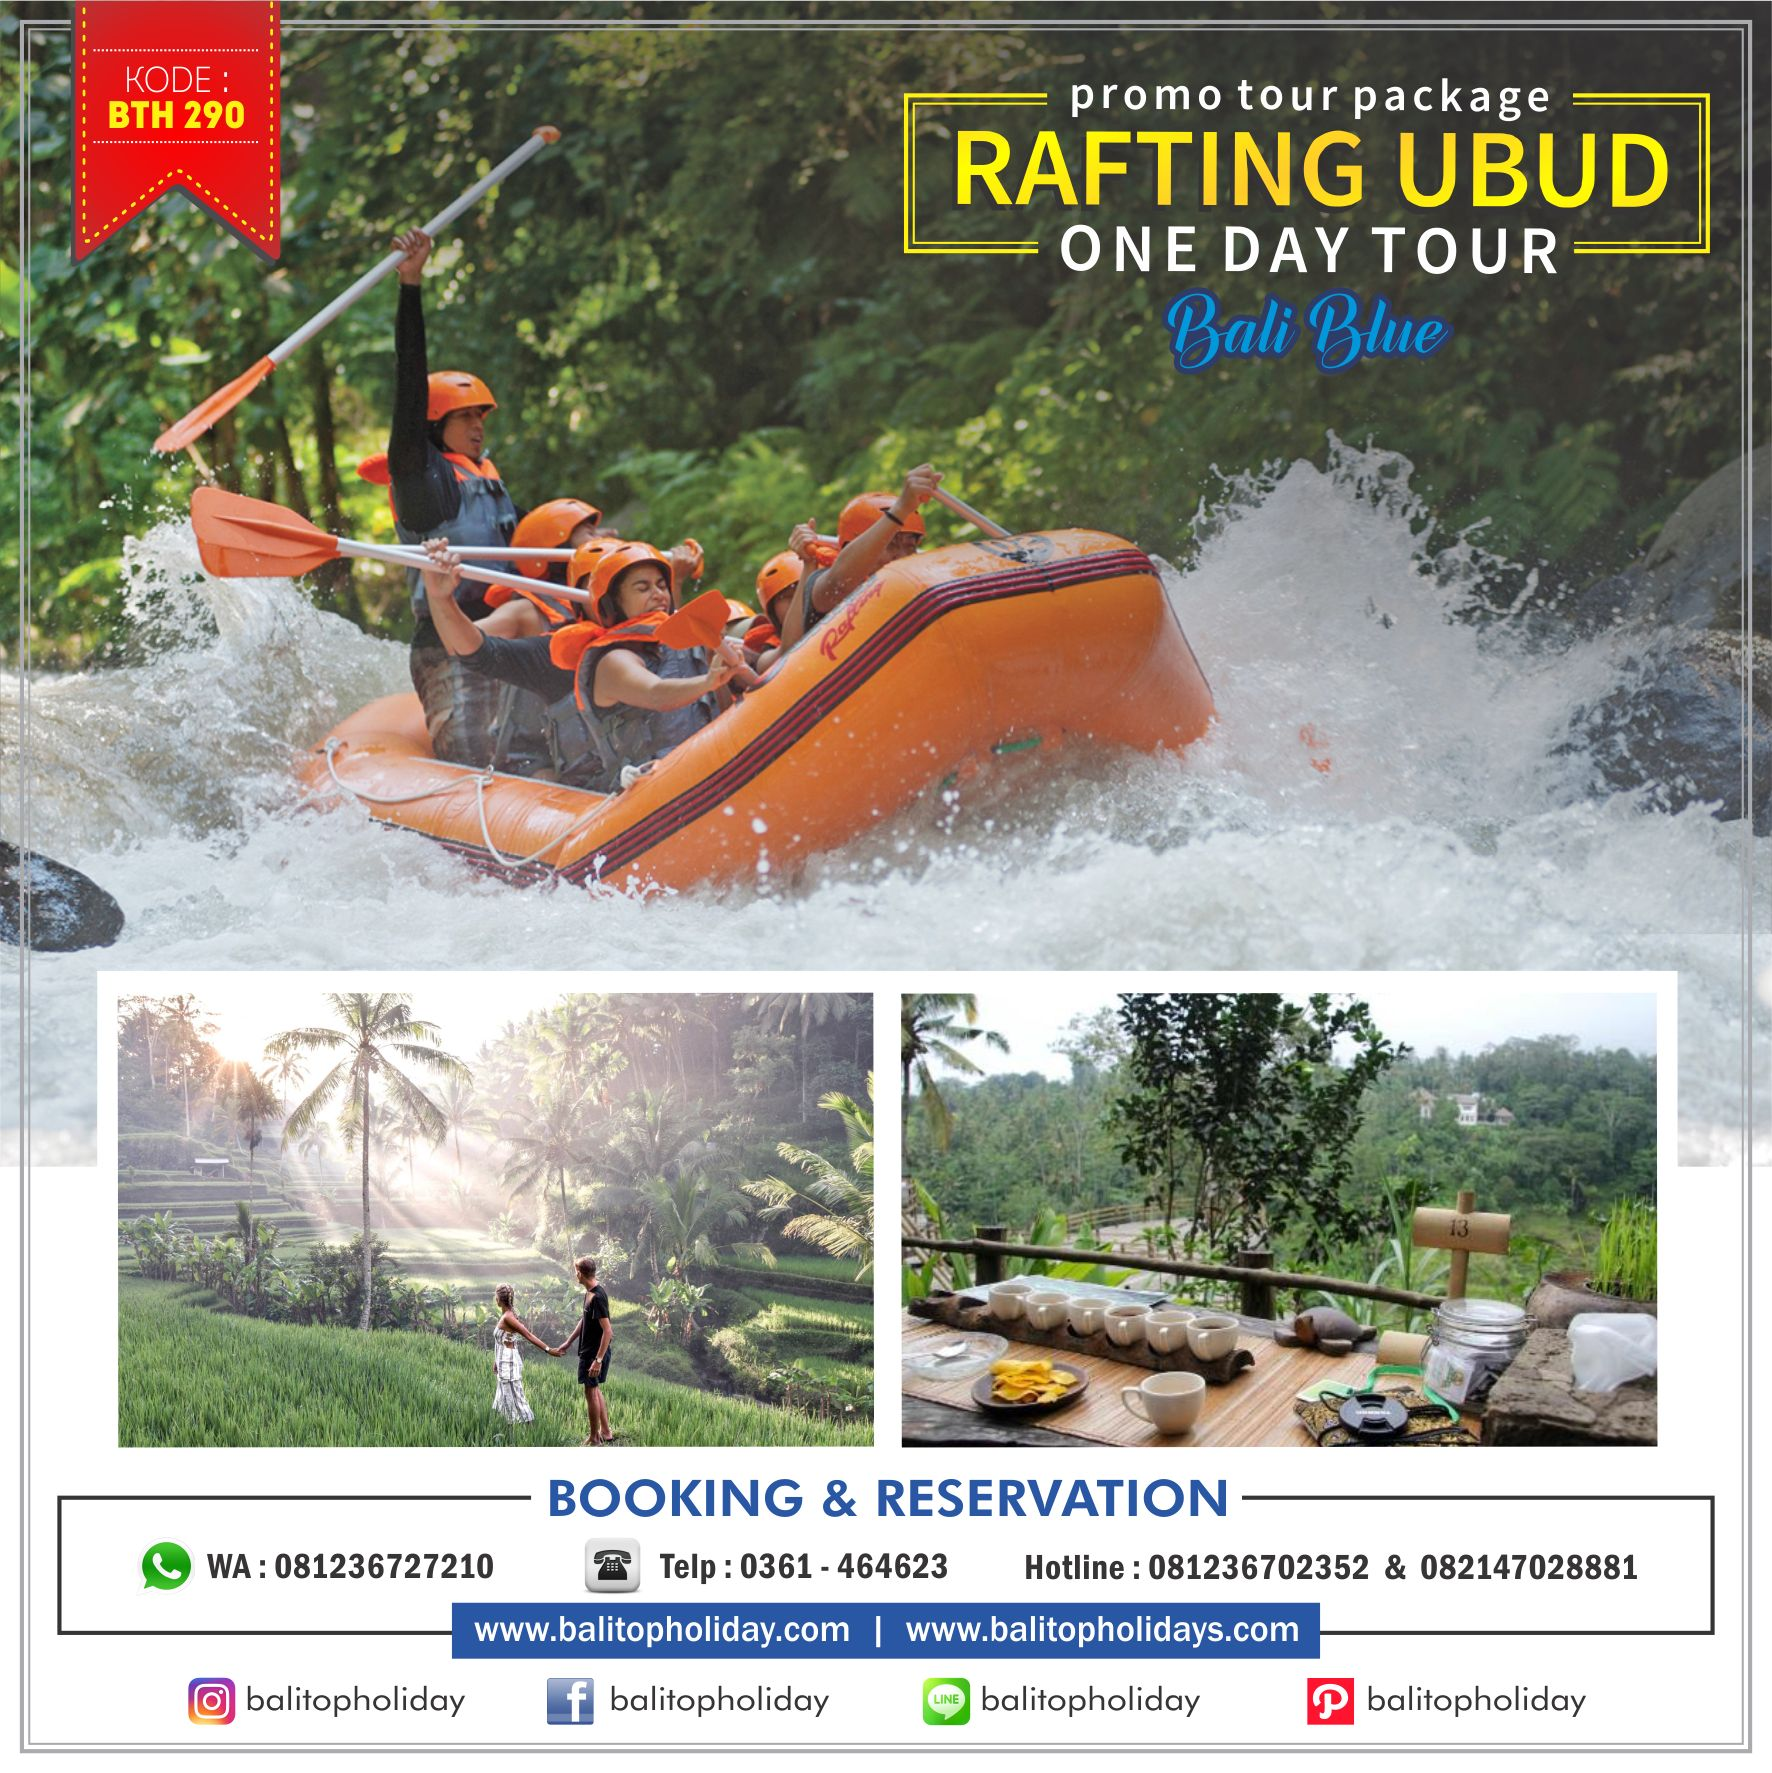 rafting ubud One Day Tour